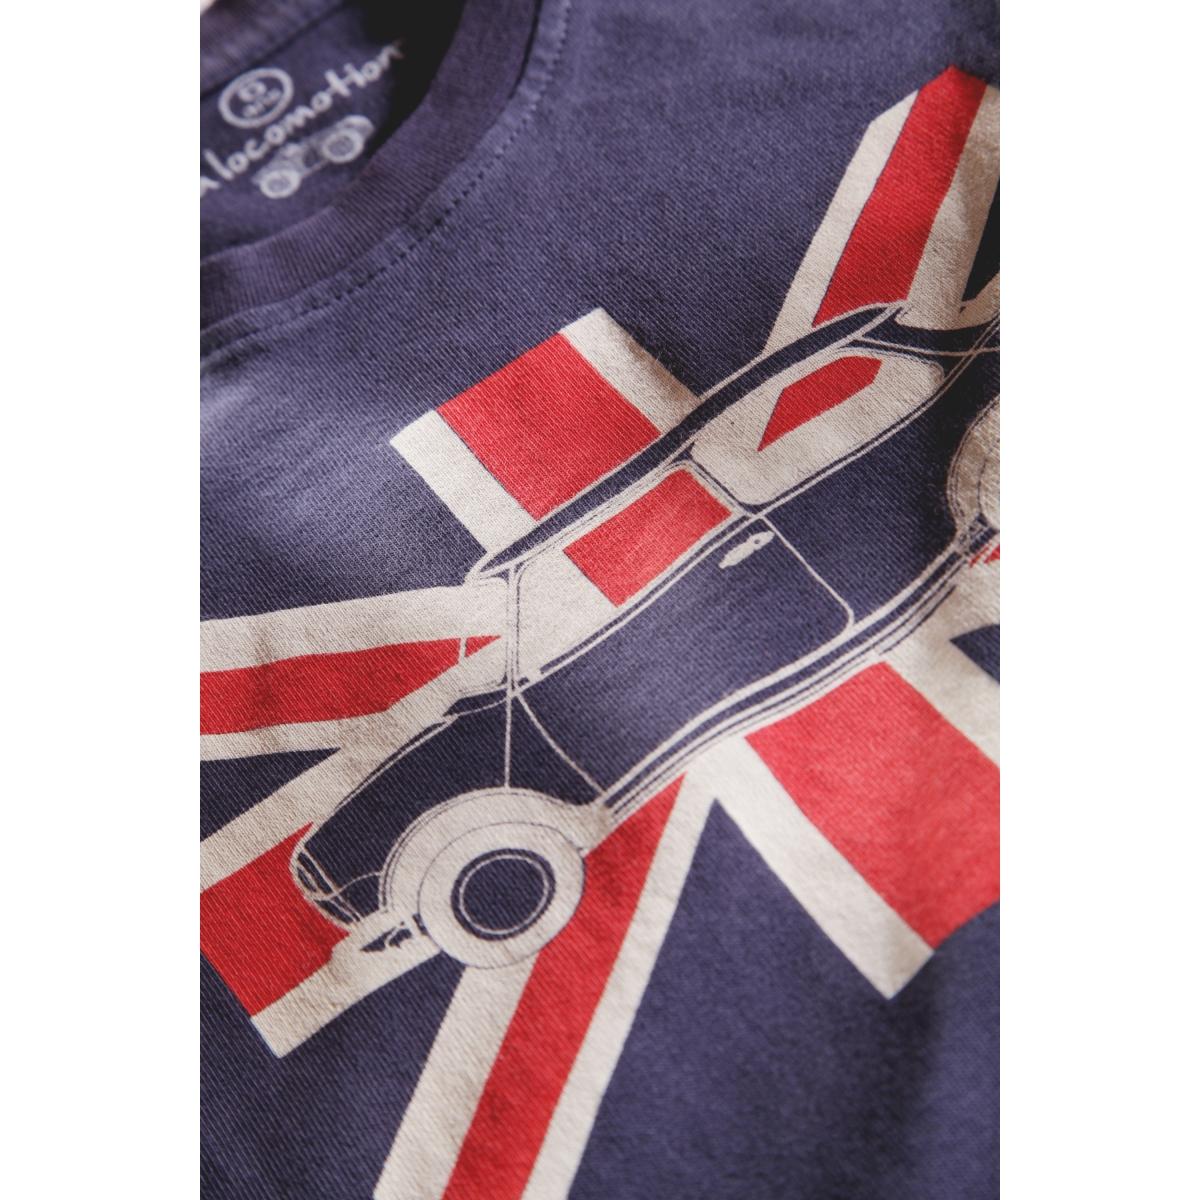 T-shirt Austin Mini drapeau anglais bleu grisé